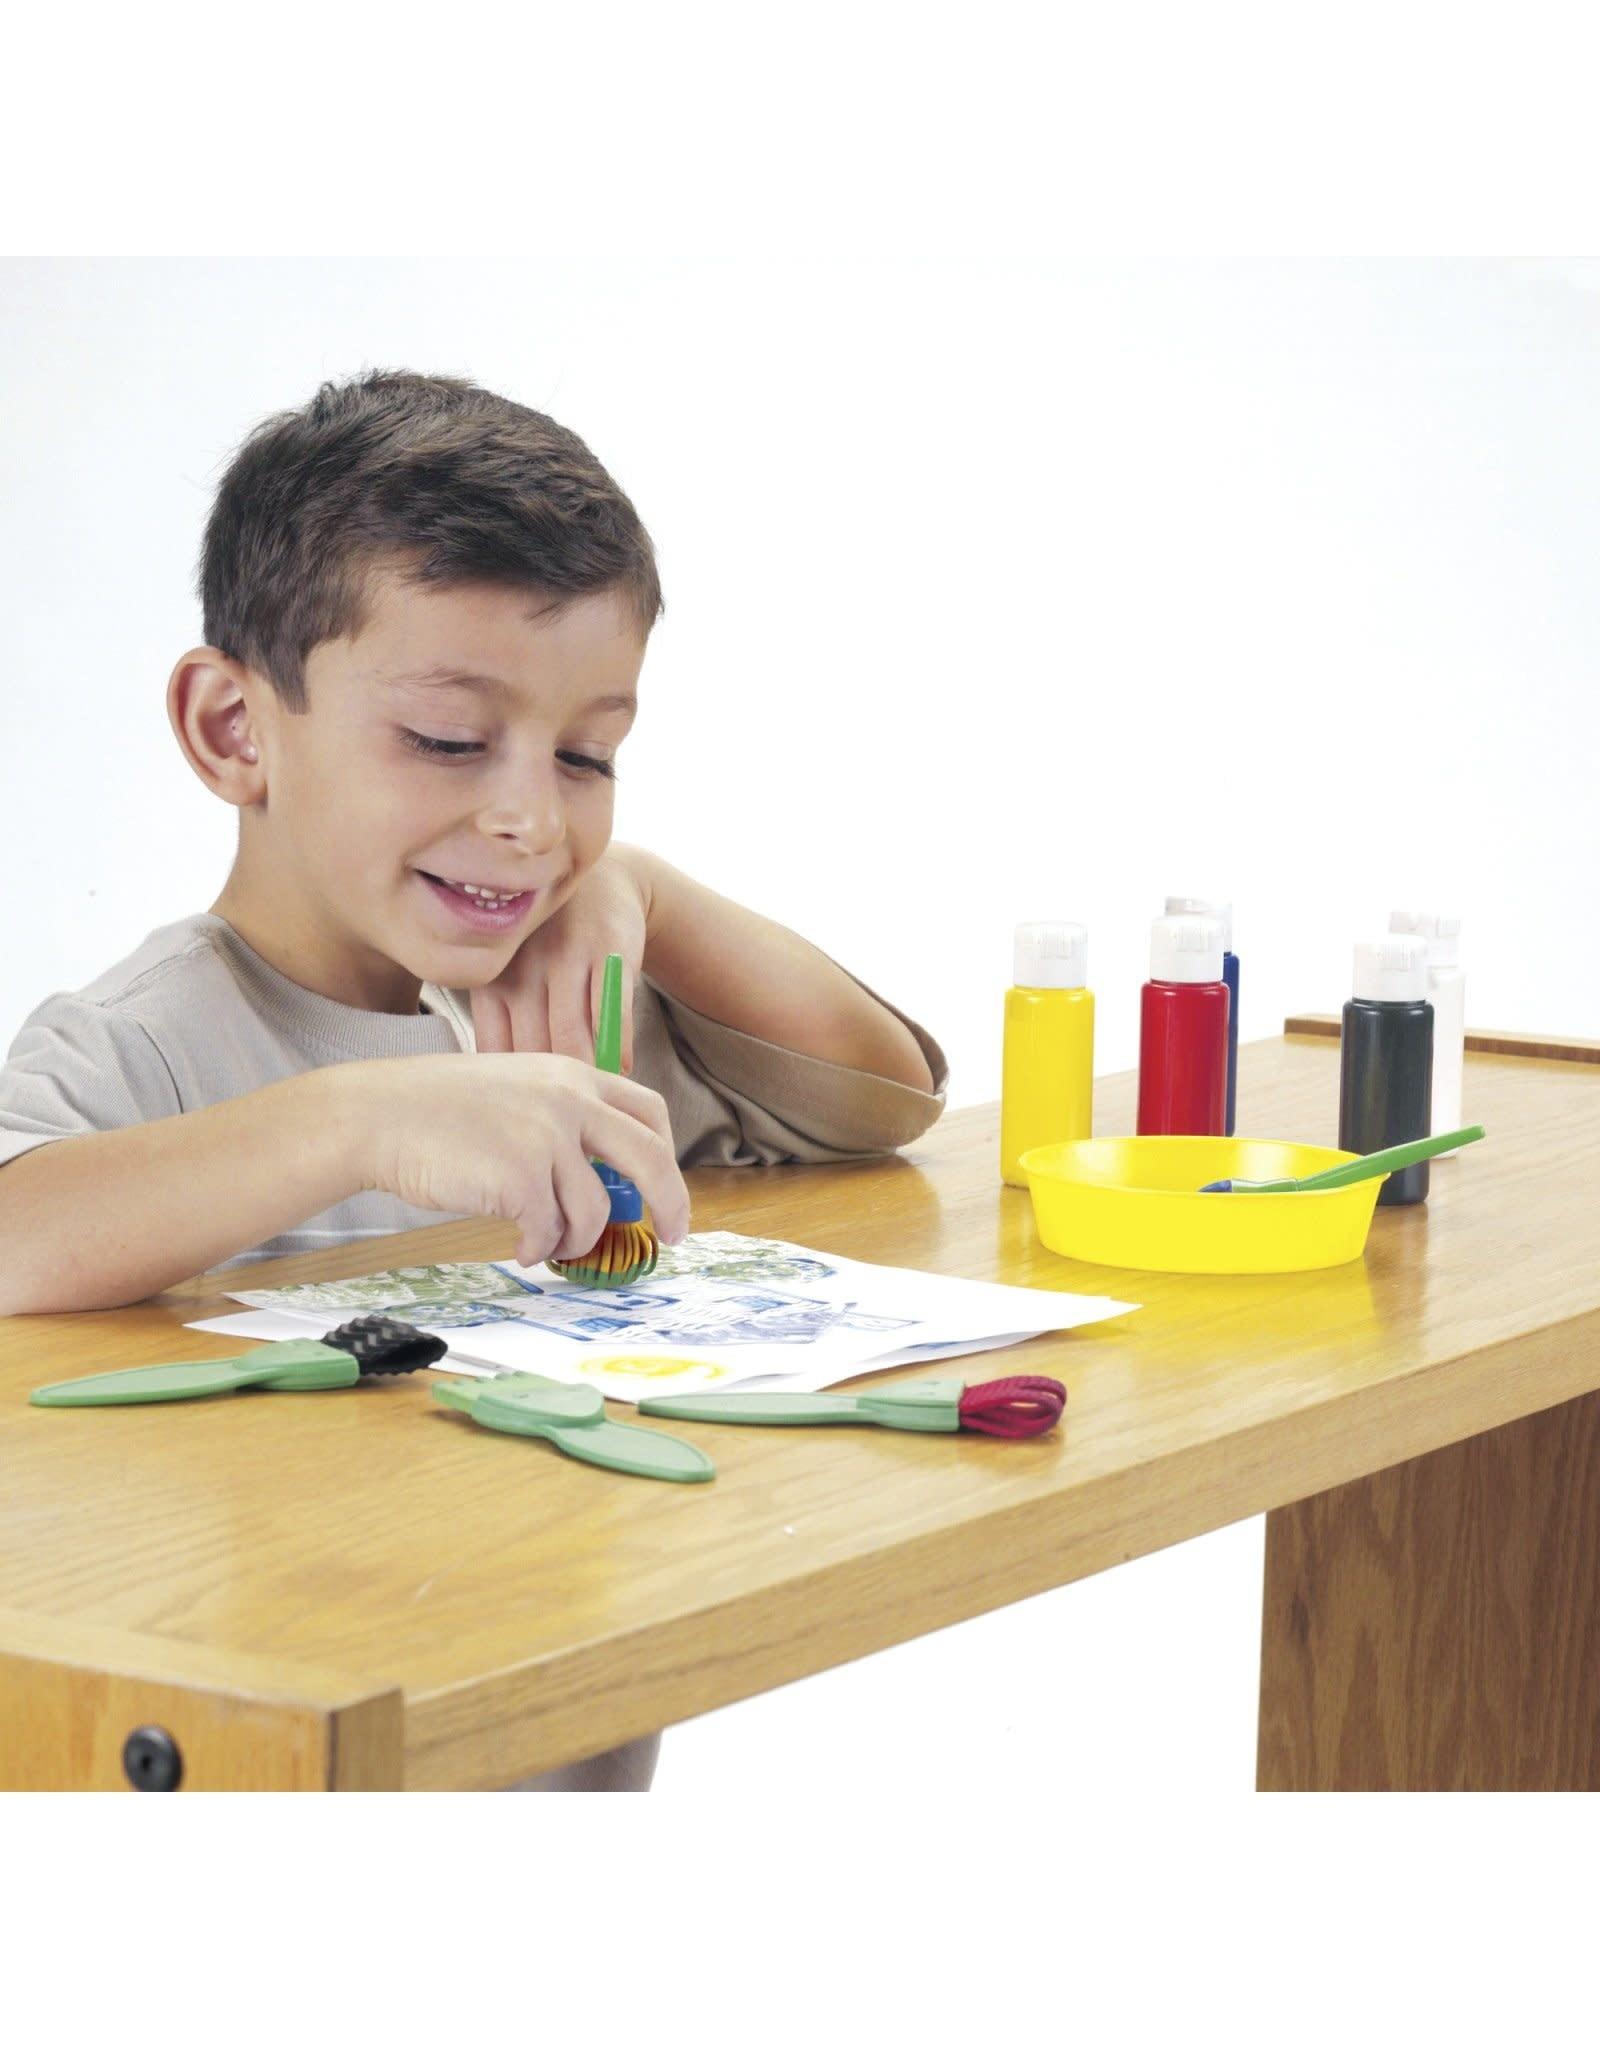 Faber-Castell Art Kit Texture Painting Set